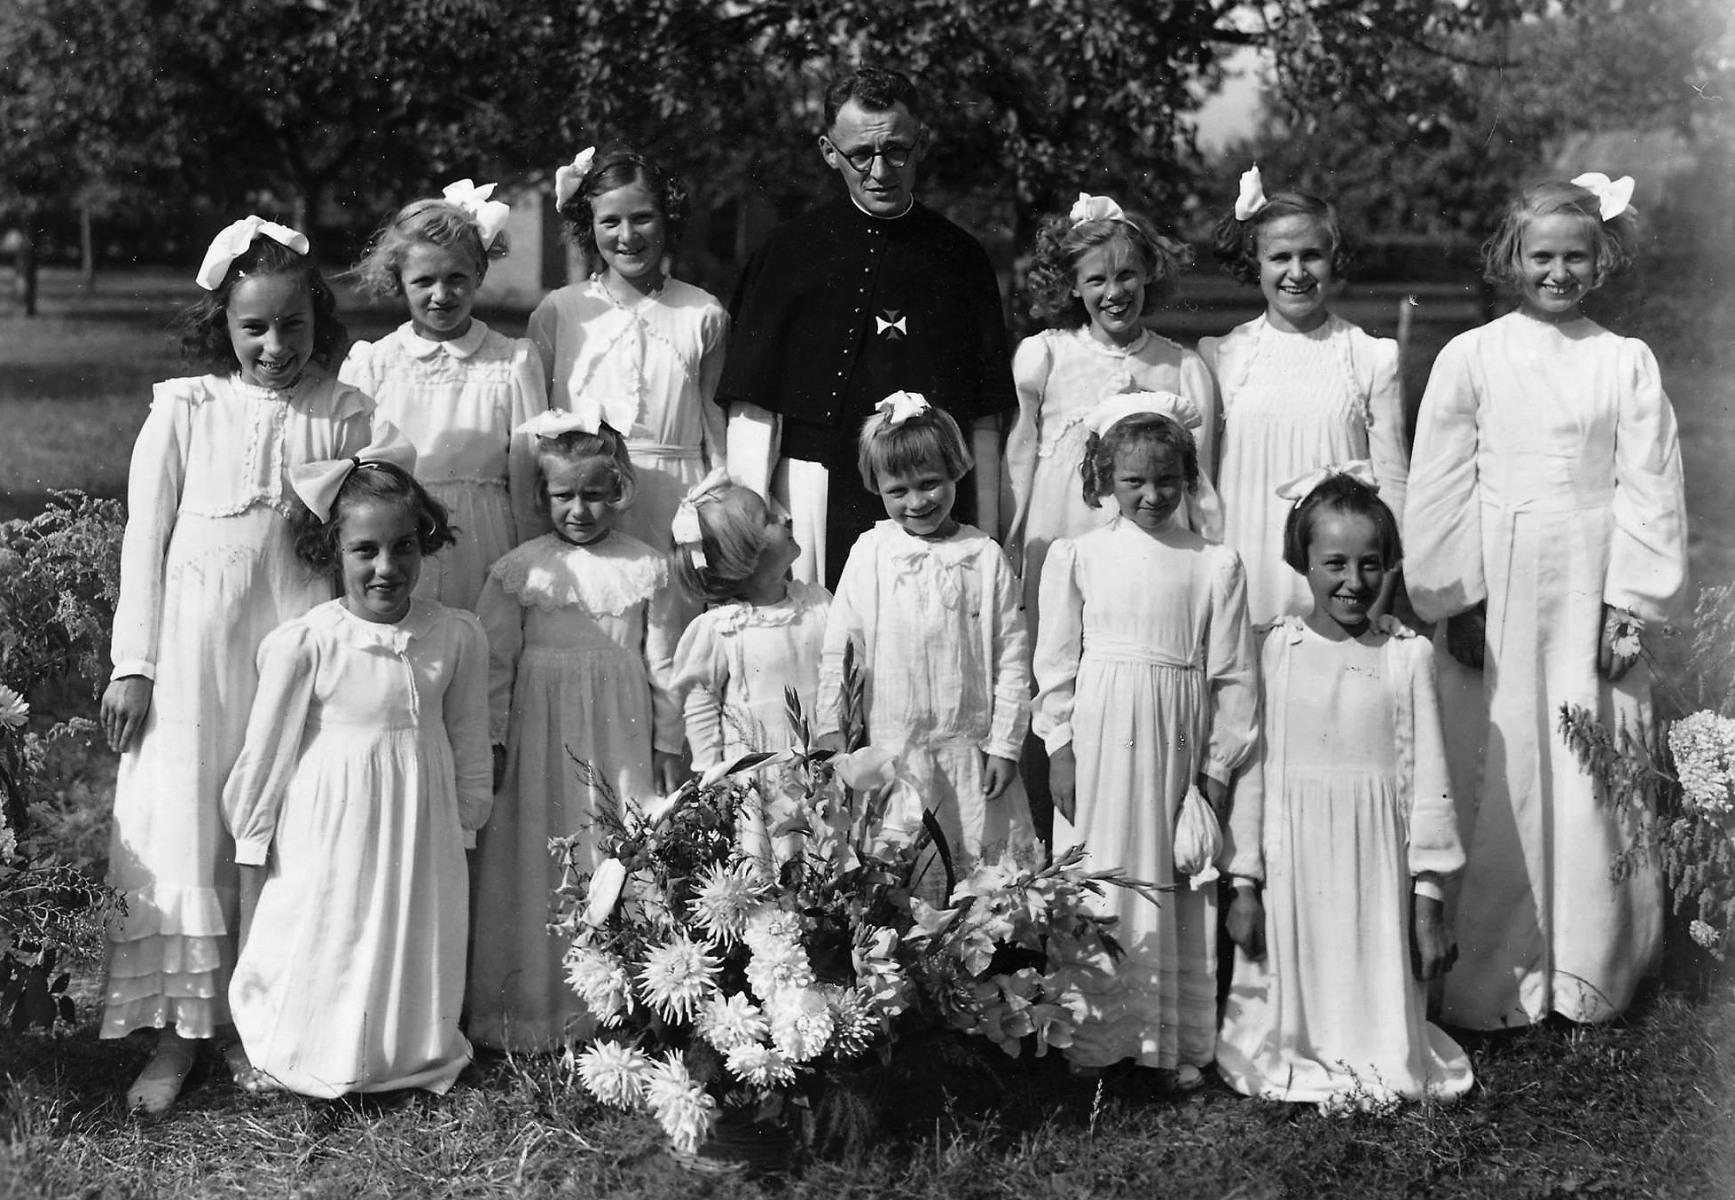 Datering 1947. priester-fesst-Gidus-Donkers